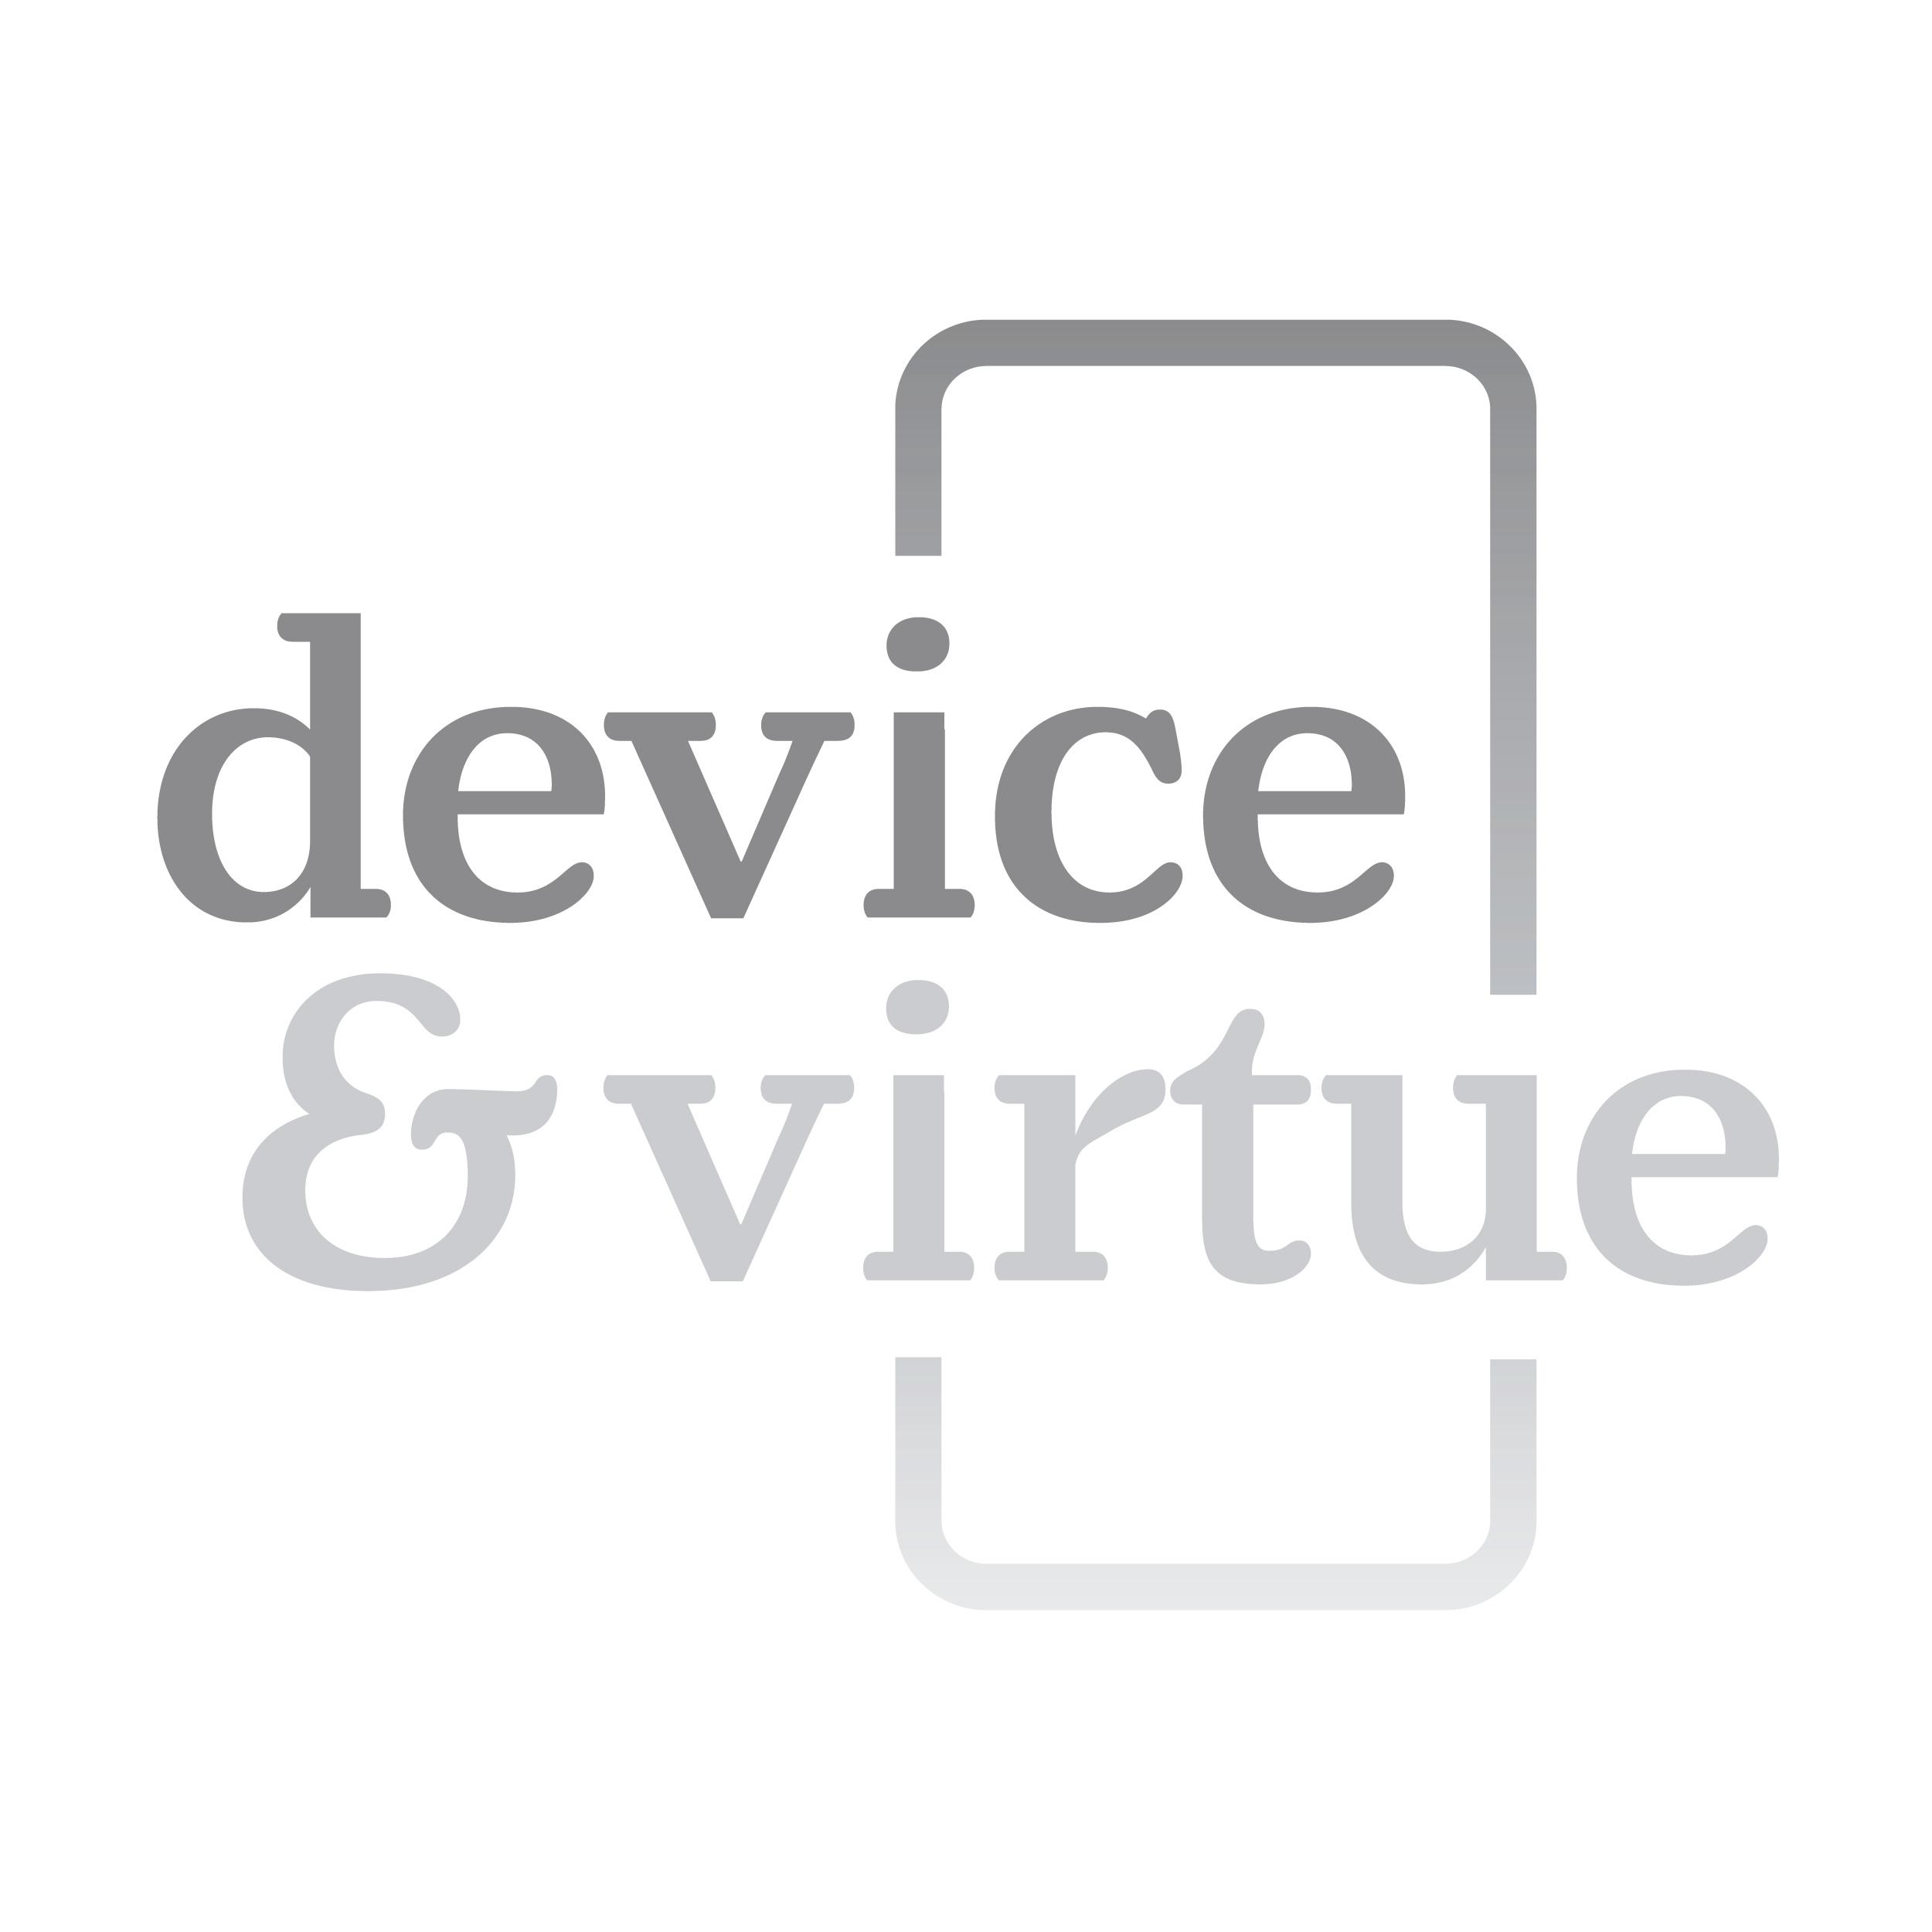 device%26virtue_transparent_2500.jpg